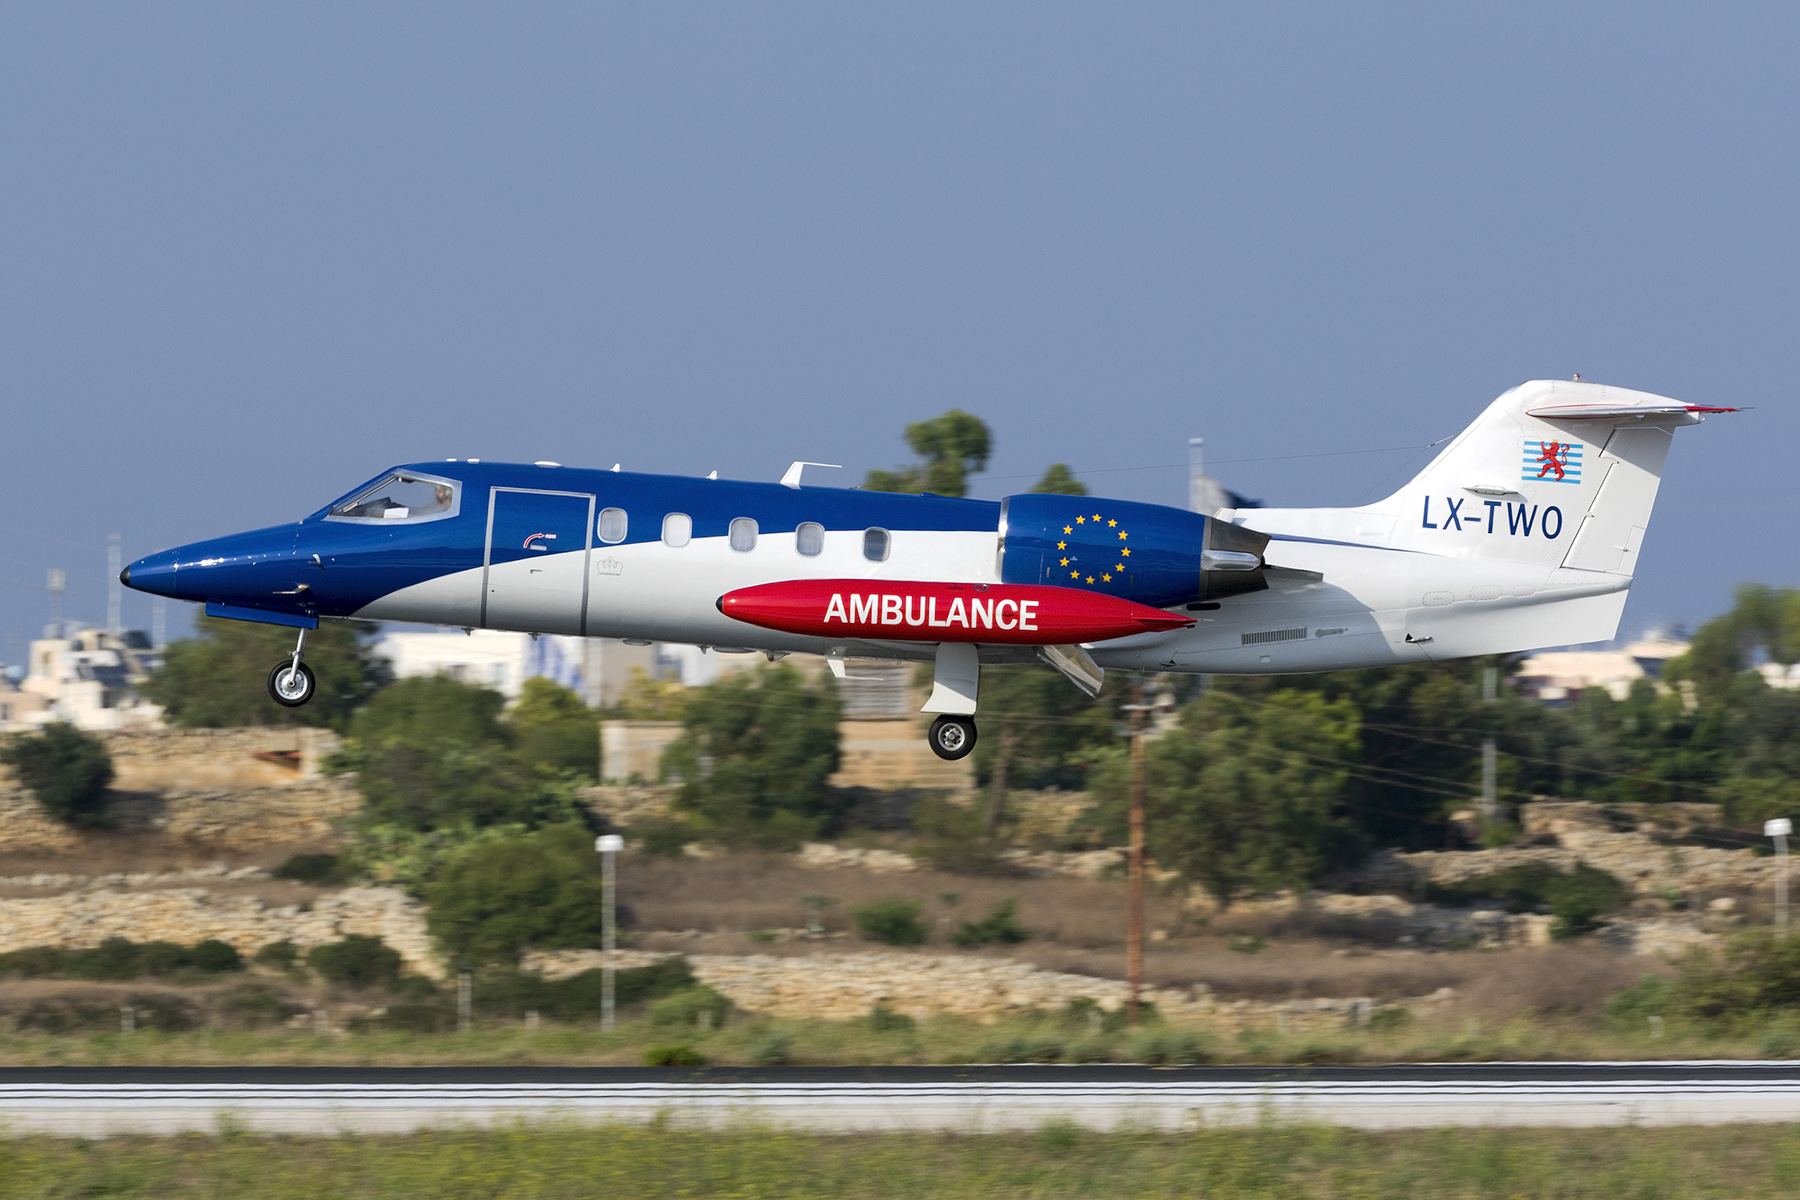 Luxembourg Air Ambulance